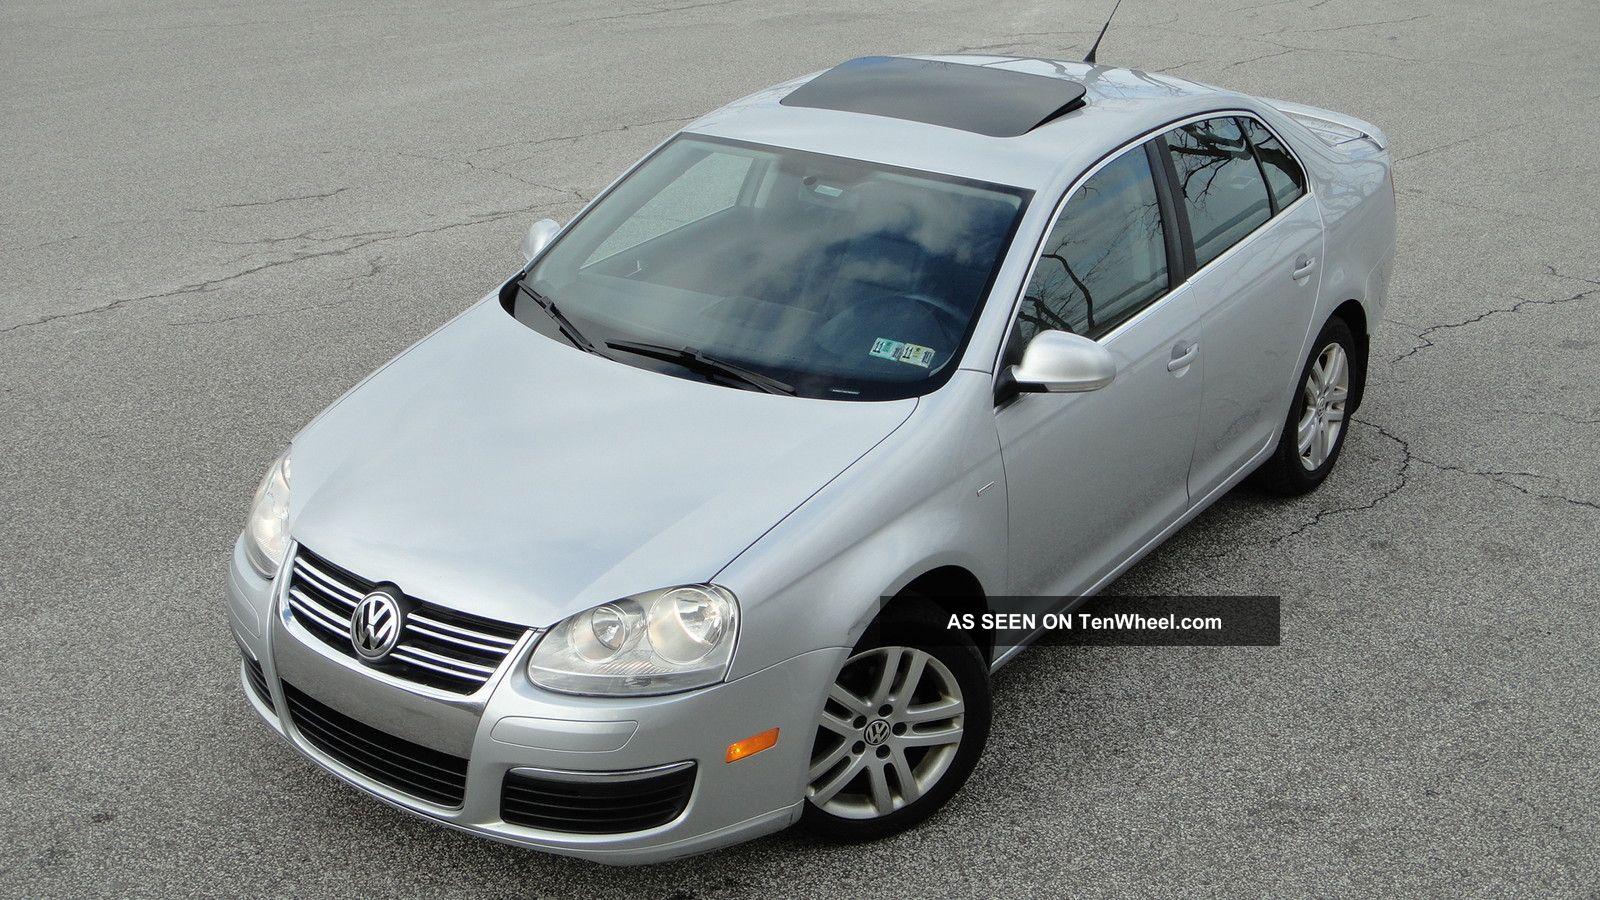 2007 Volkswagen Jetta 2.  5l Wolfsburg Edition Loaded - - Mp3 - - 1owner Jetta photo